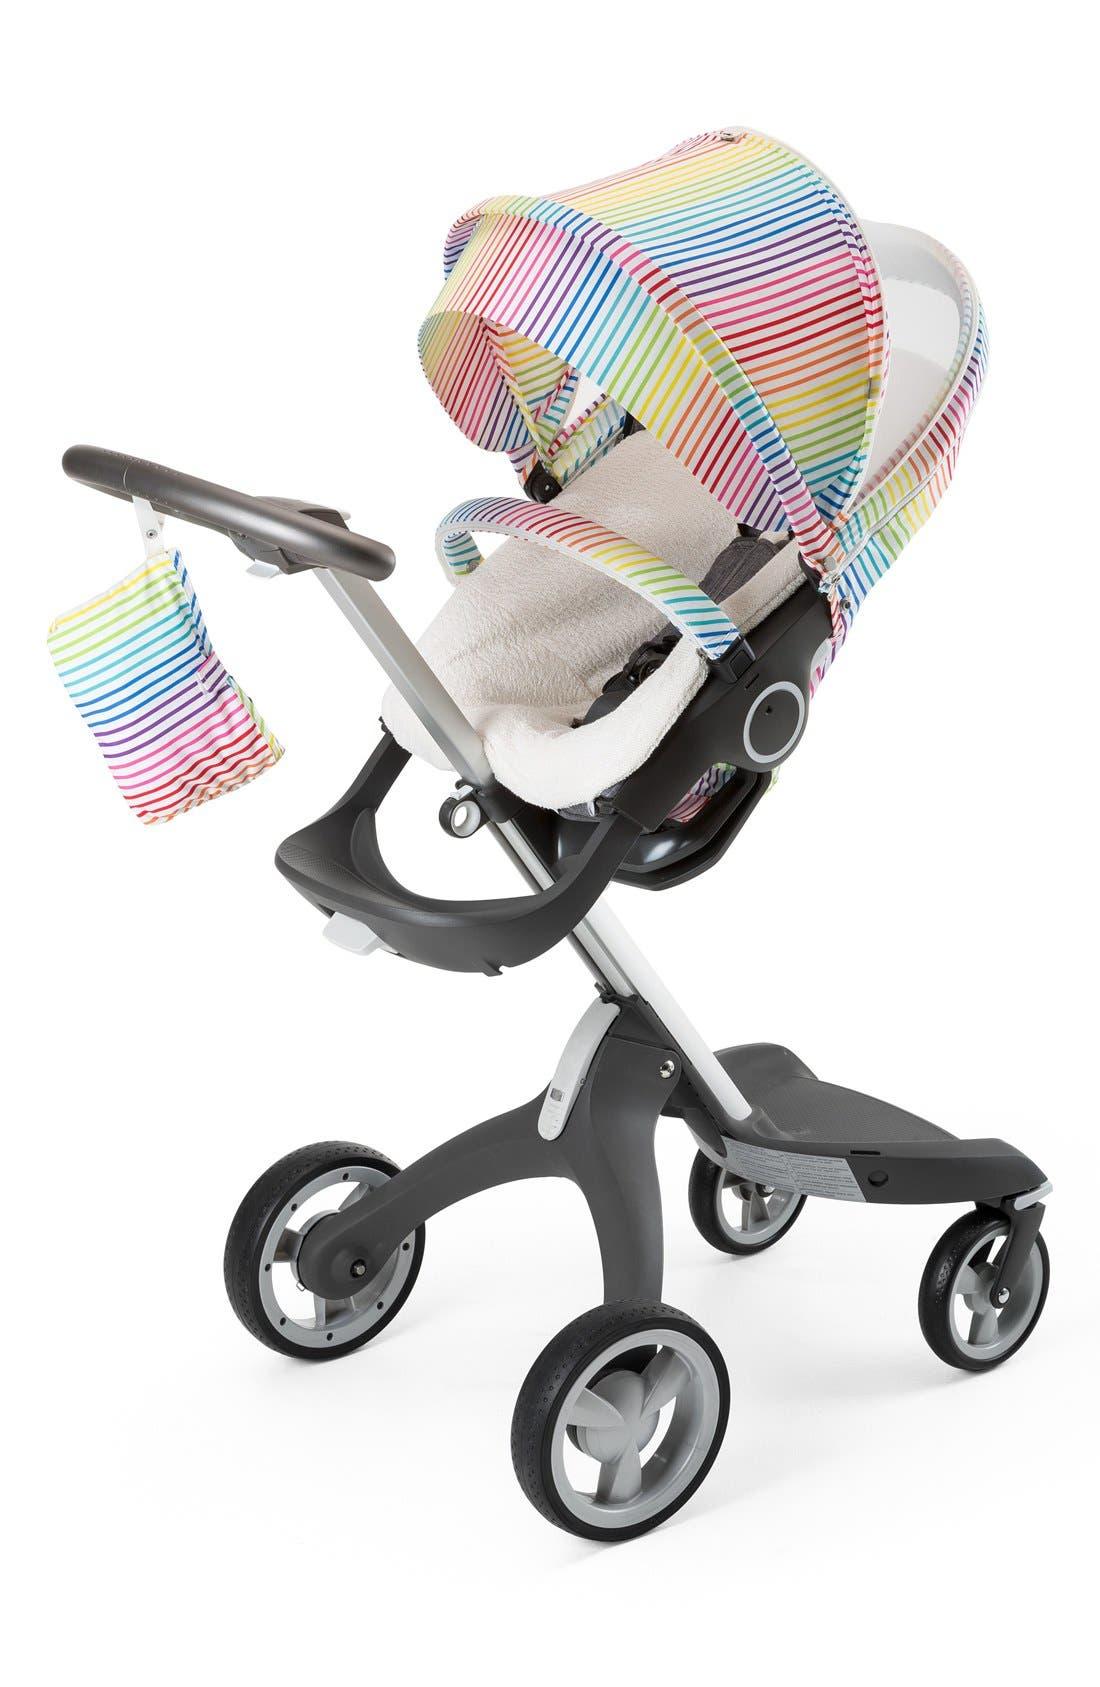 'Xplory<sup>®</sup> Stroller Summer Kit' Shade Set,                             Main thumbnail 1, color,                             Multi Stripe